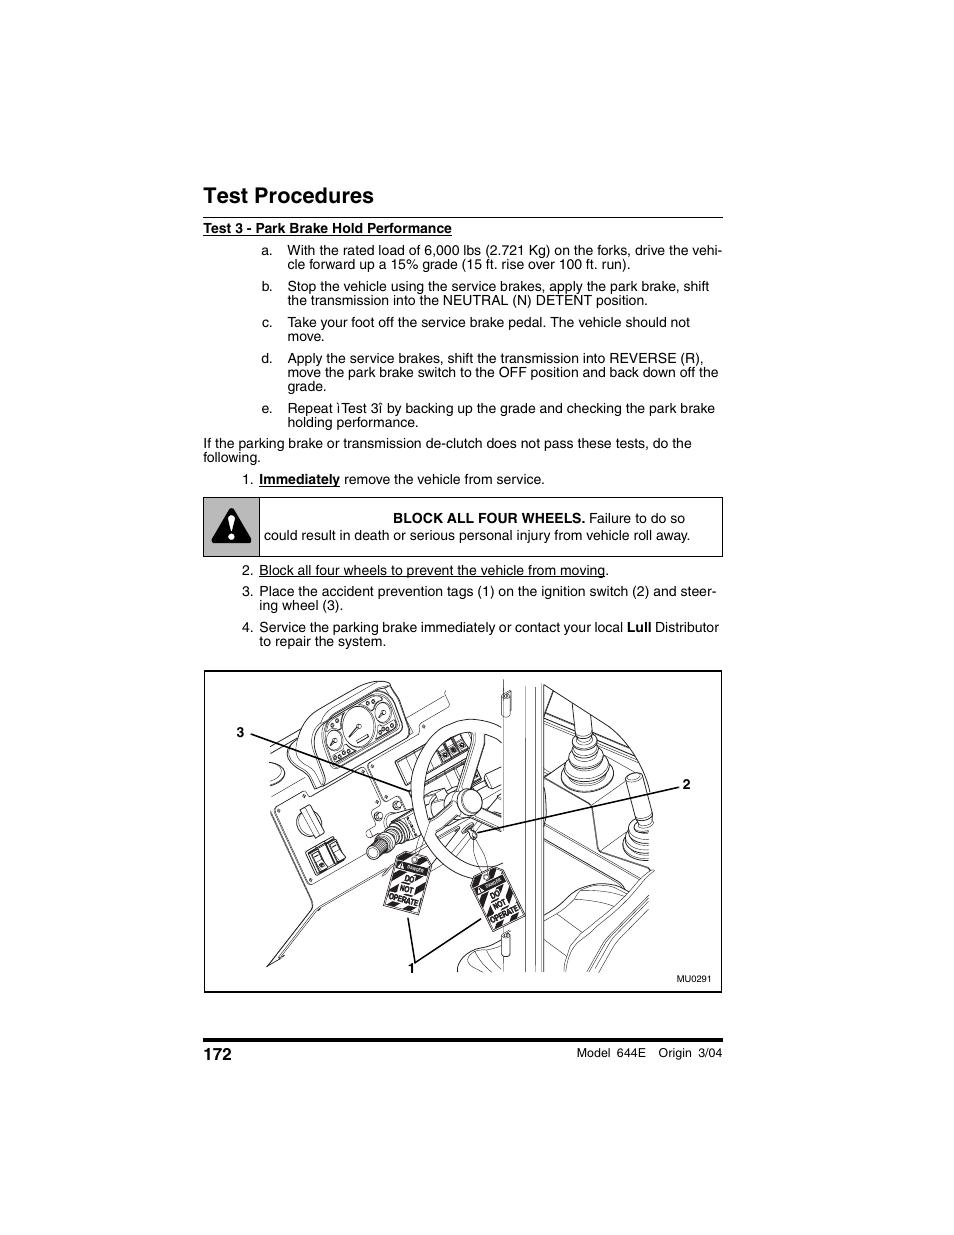 immediately remove the vehicle from service warning test rh manualsdir com Lull 644 Exhaust Syastem lull 644b service manual